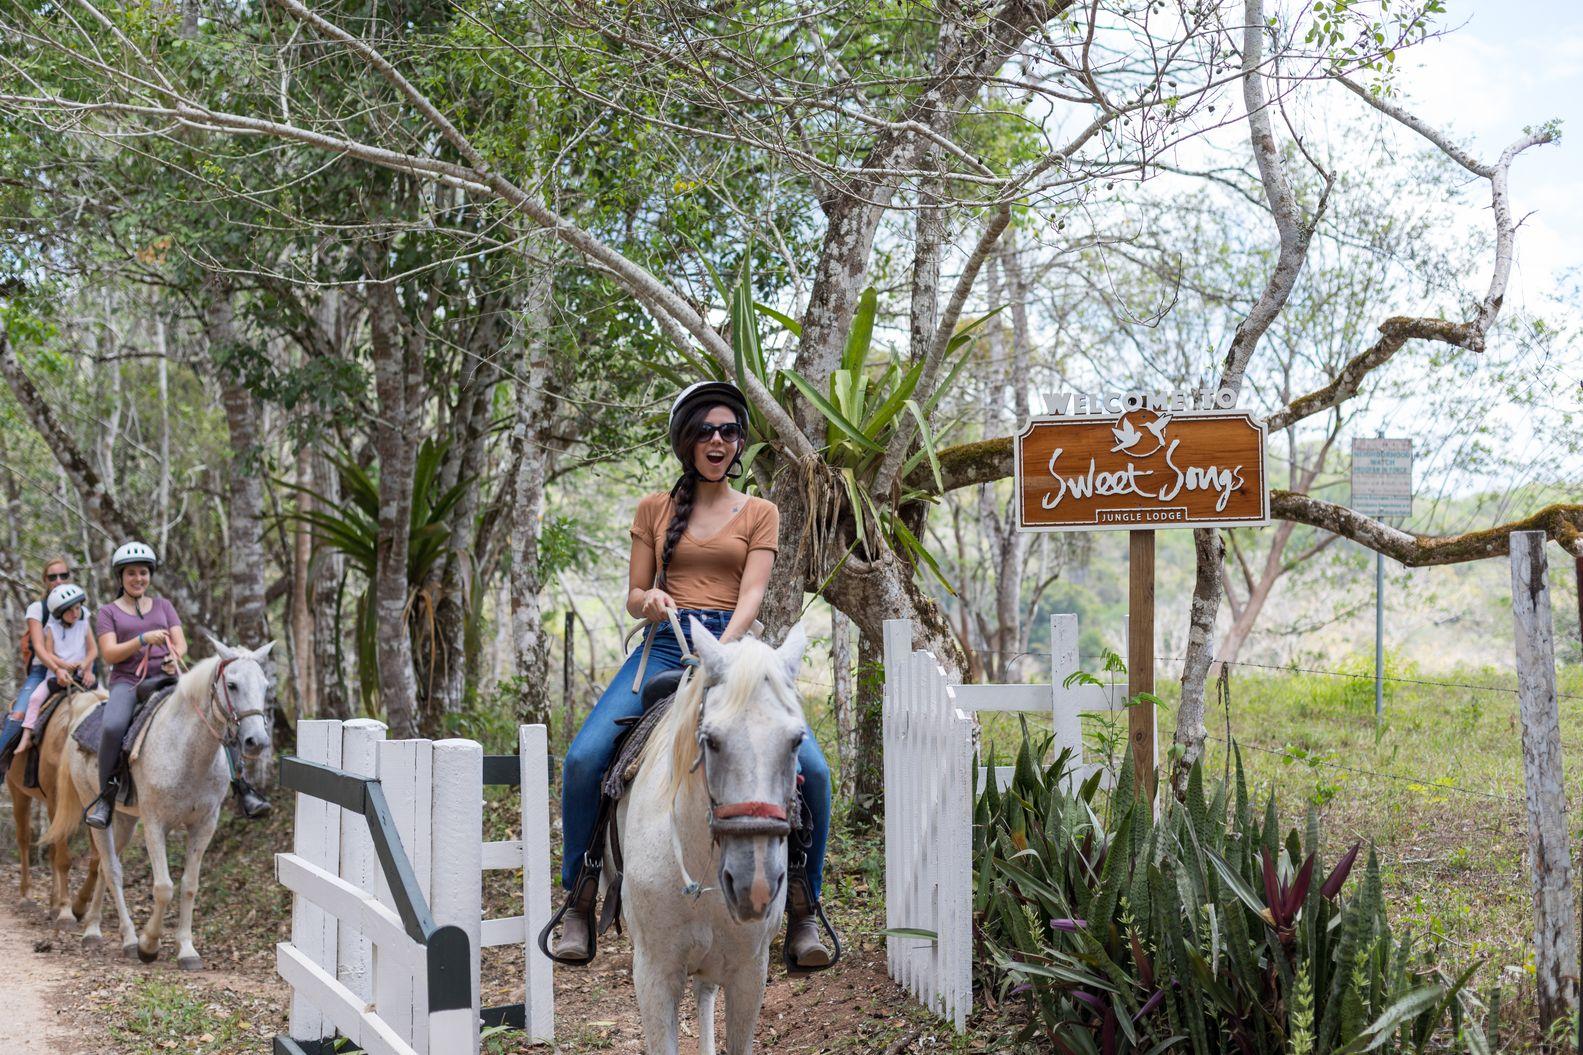 Copy of 2190417sssbz00_horse-back-riding-1039.jpeg